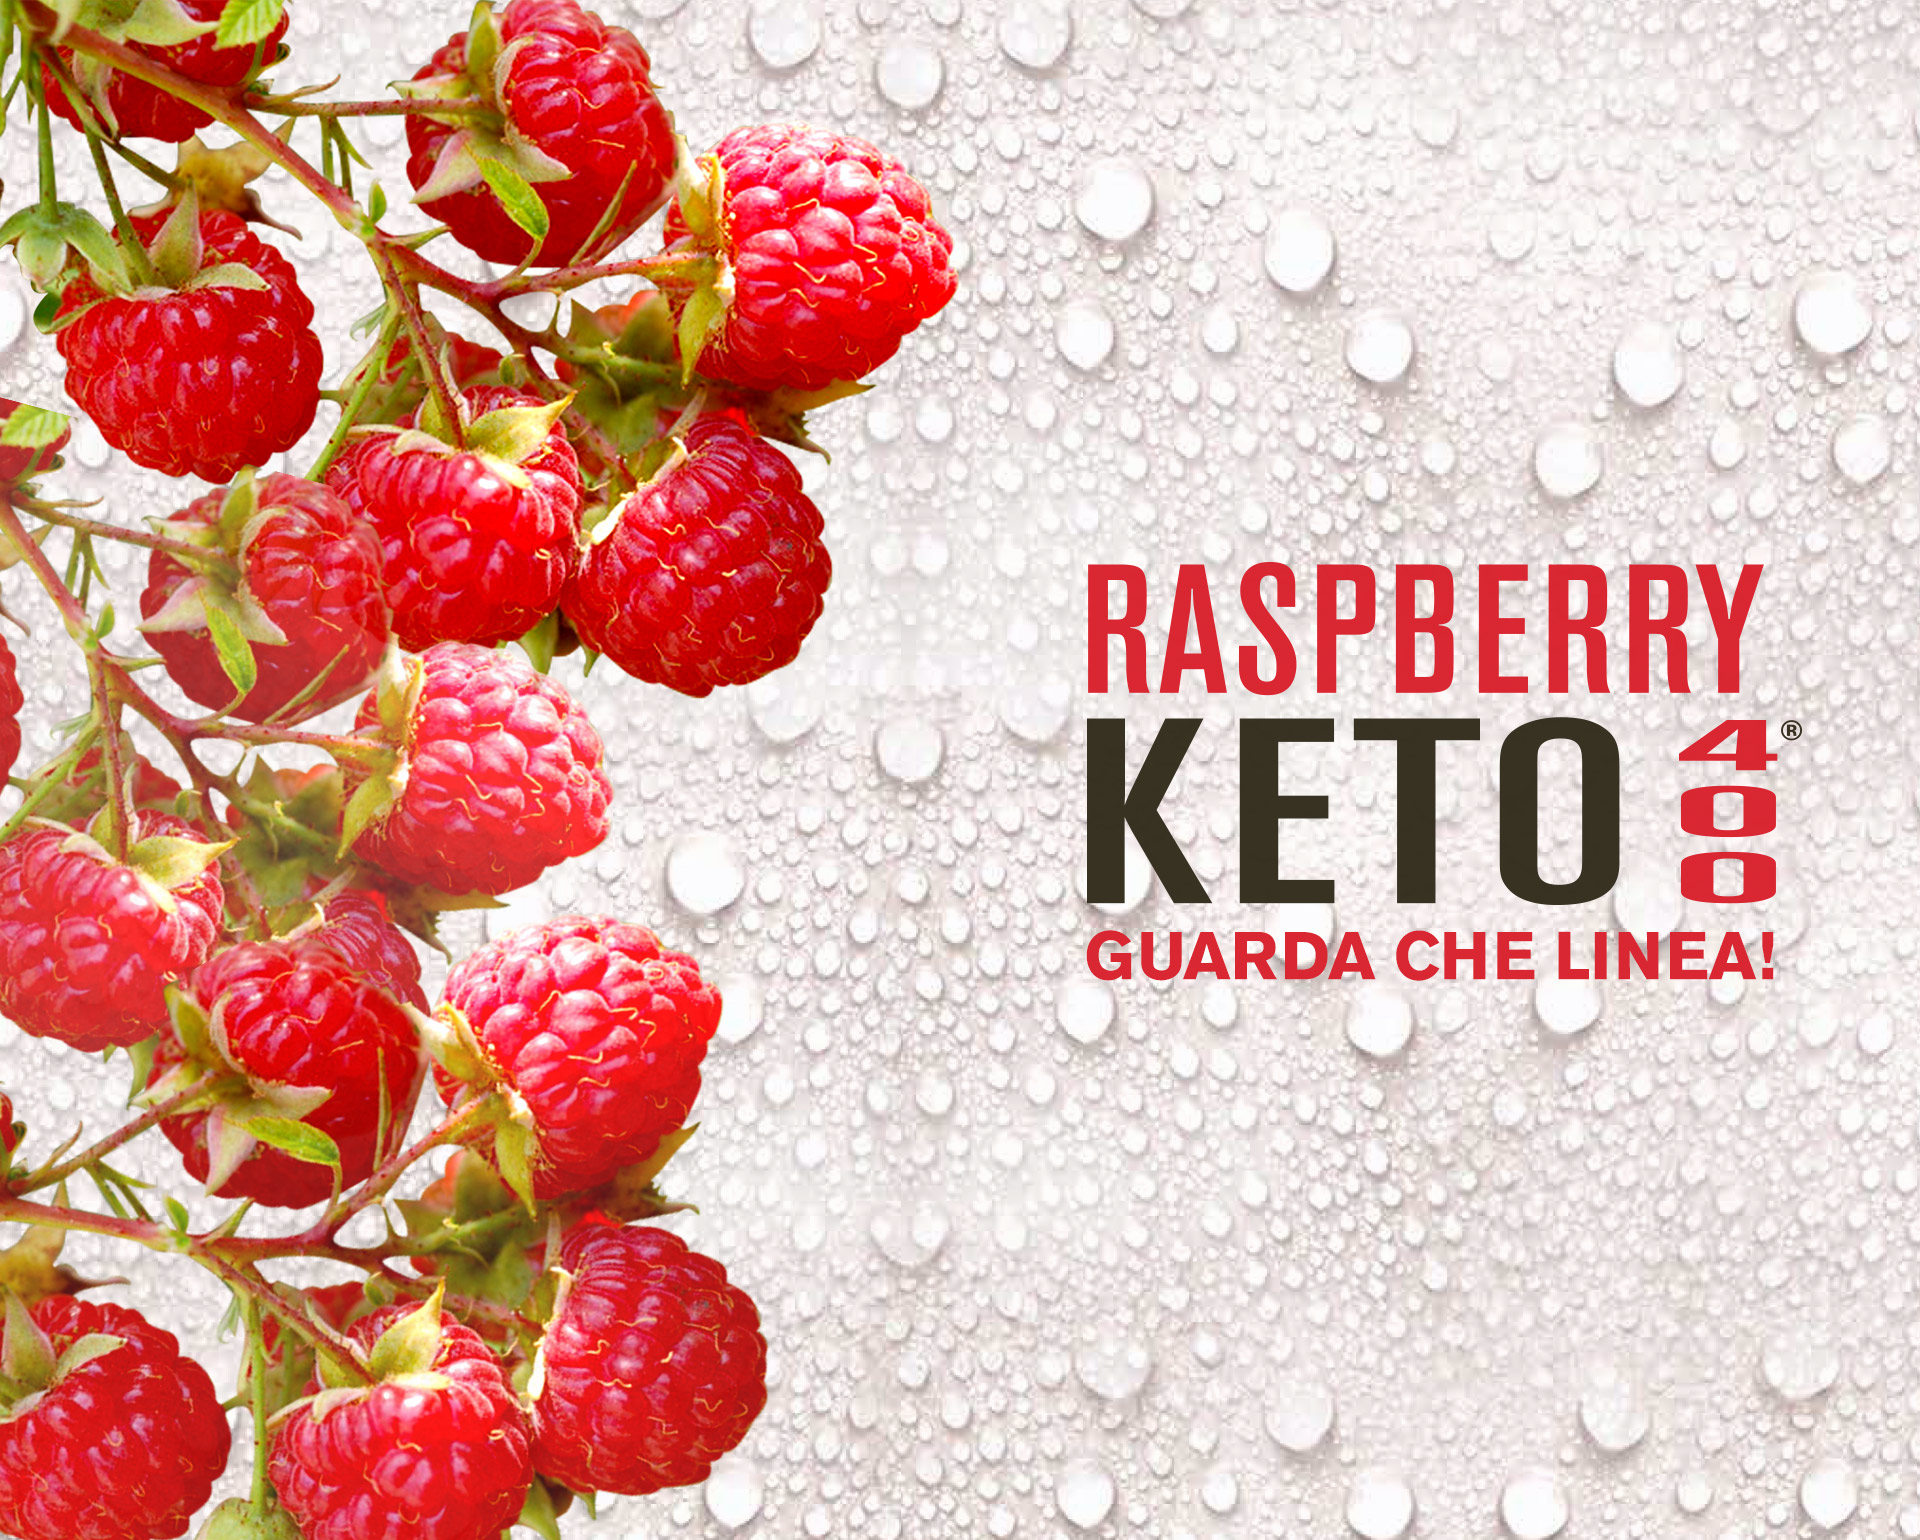 Raspberry Keton